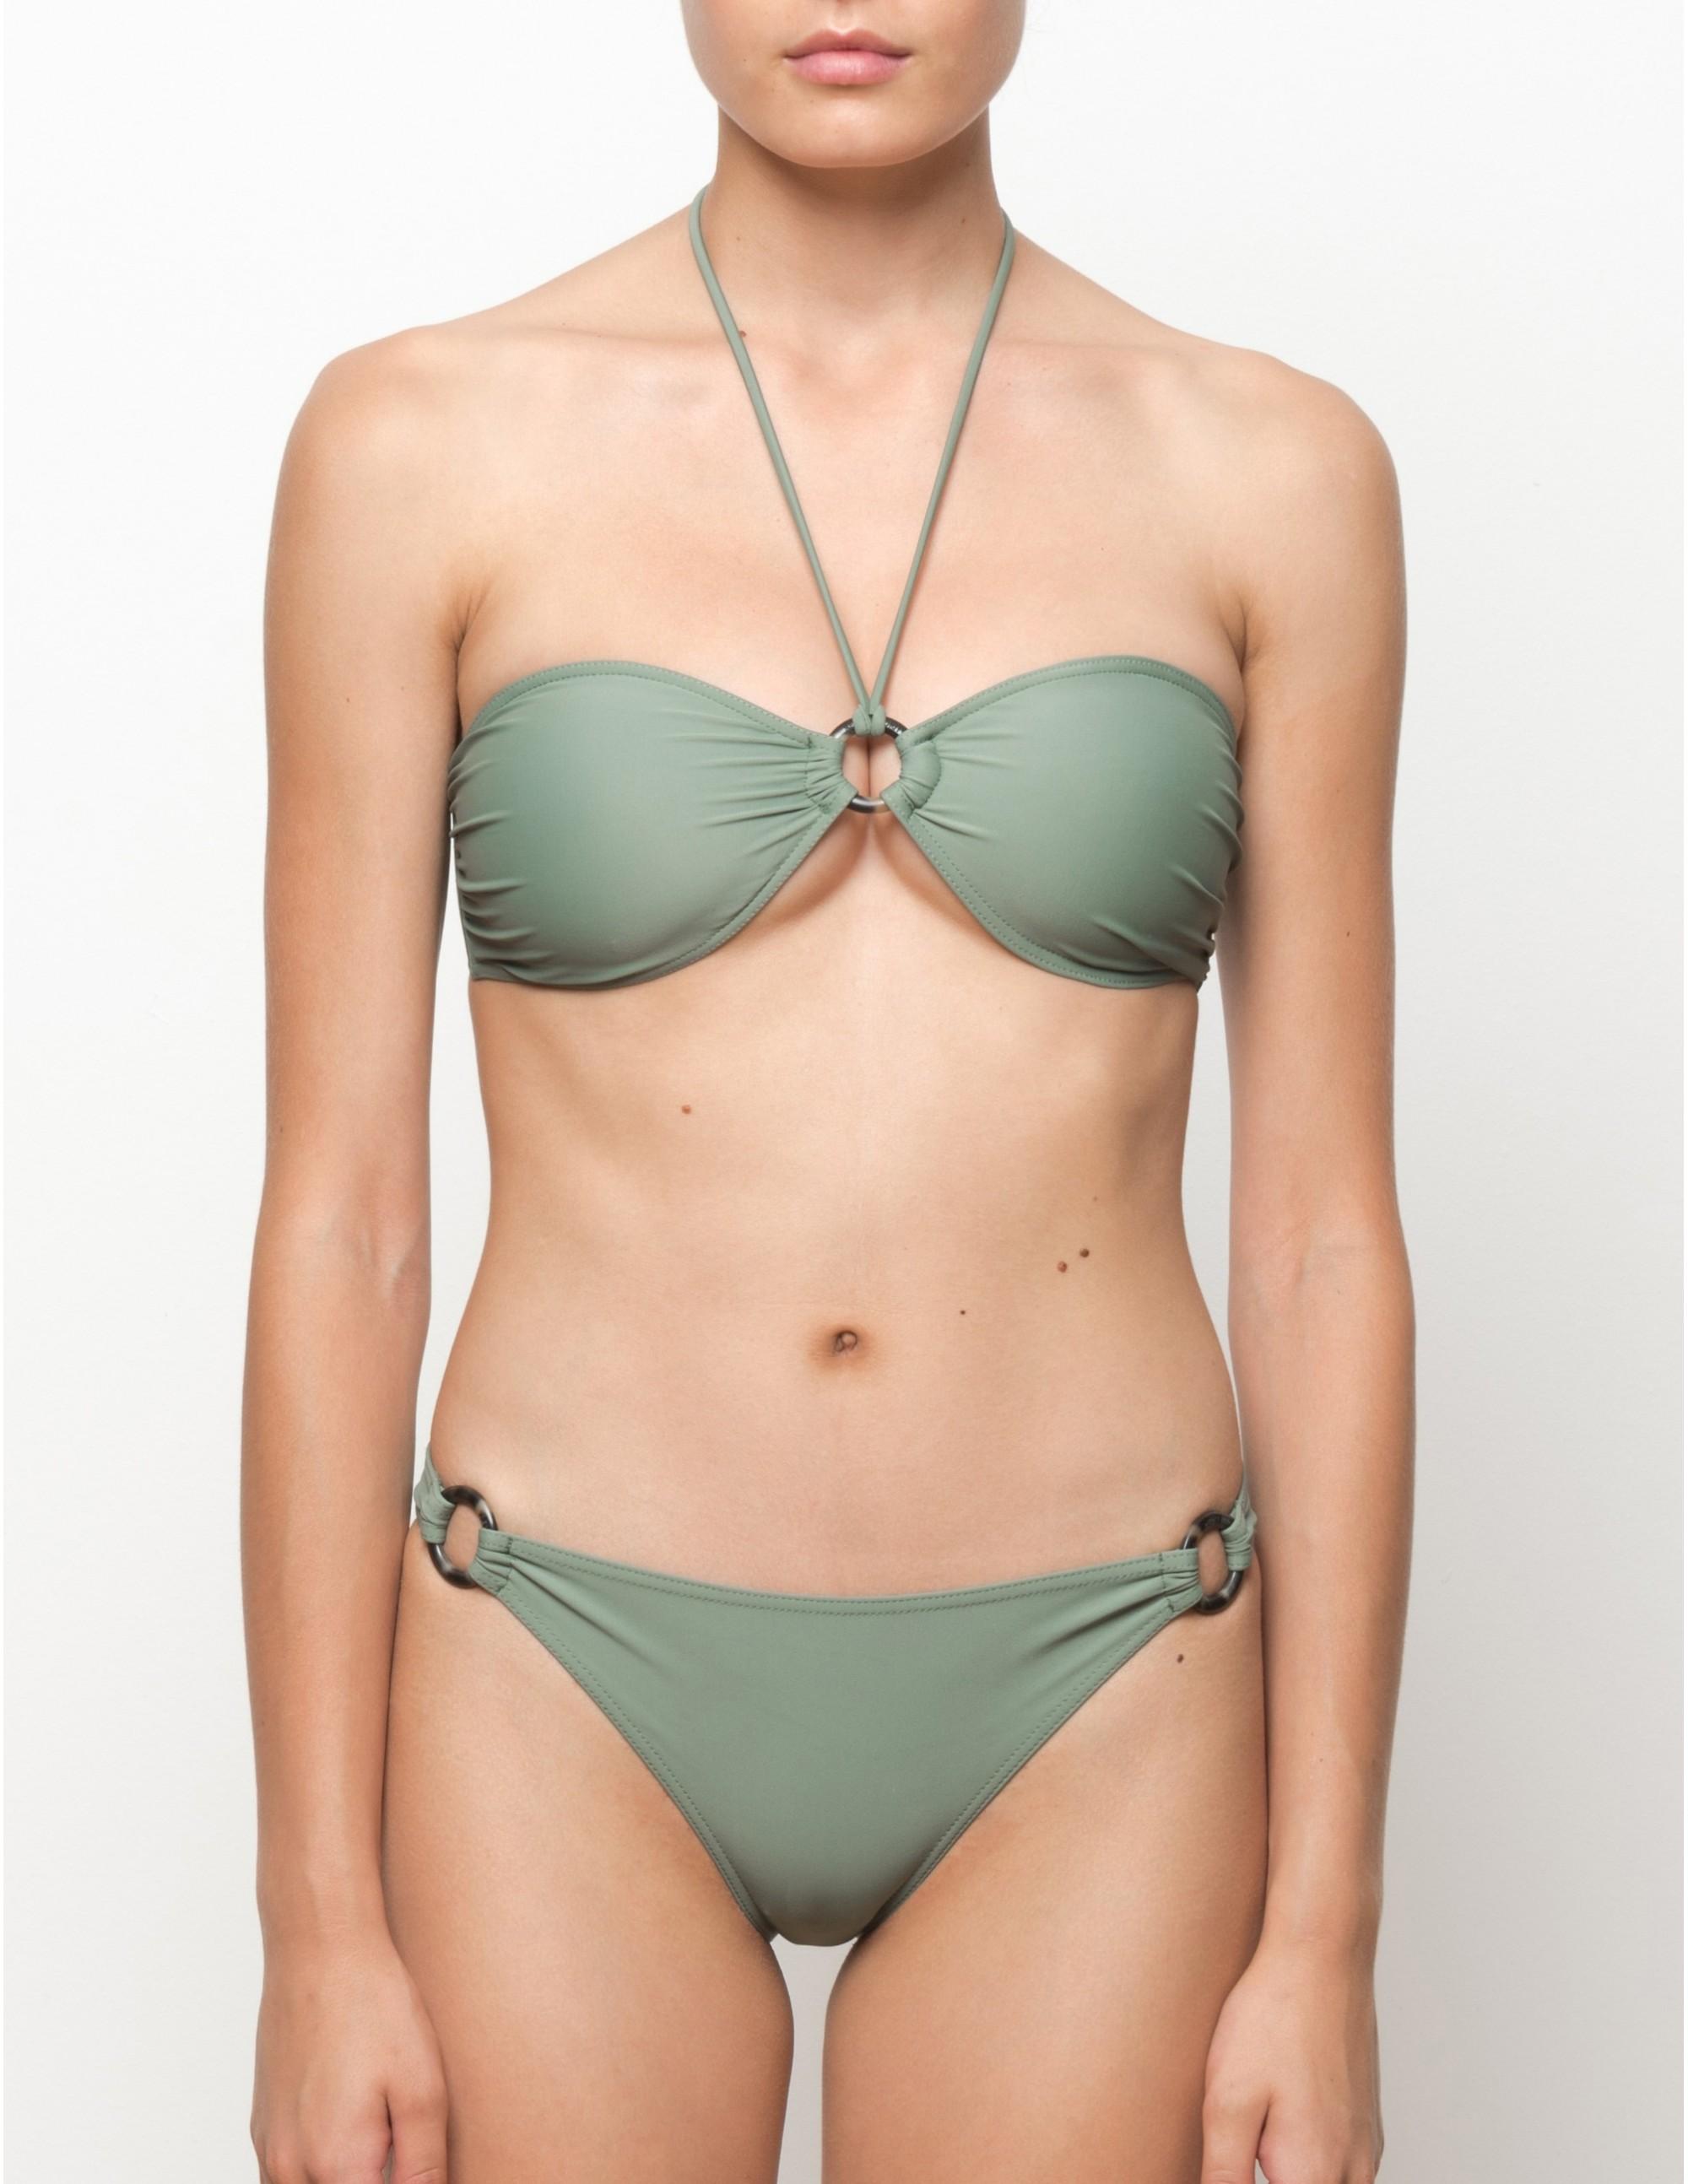 VUMA bikini top - SERENGETI